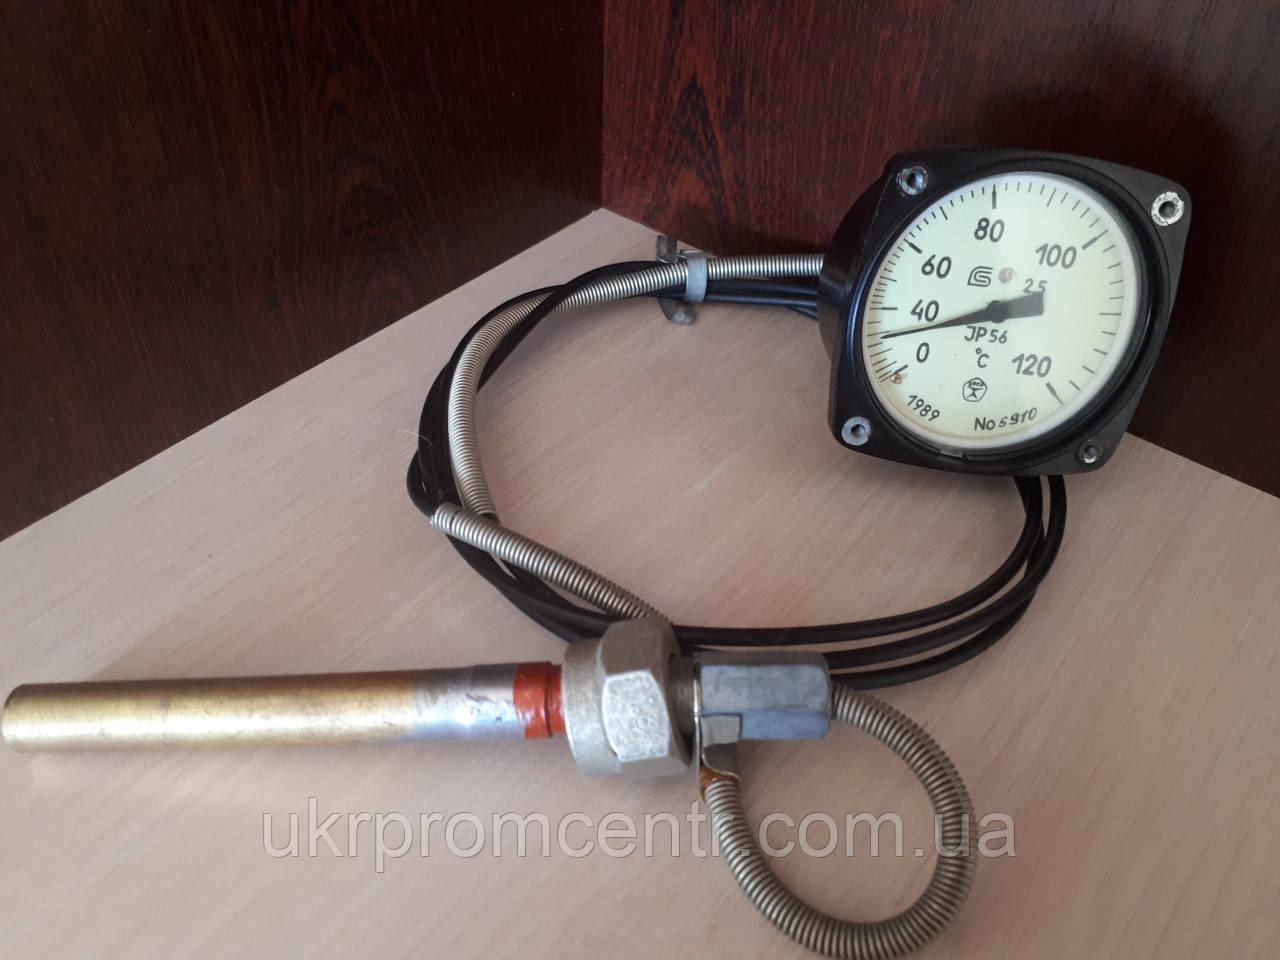 Термометр ТКП-60/3М 1,6м манометрический капиллярный